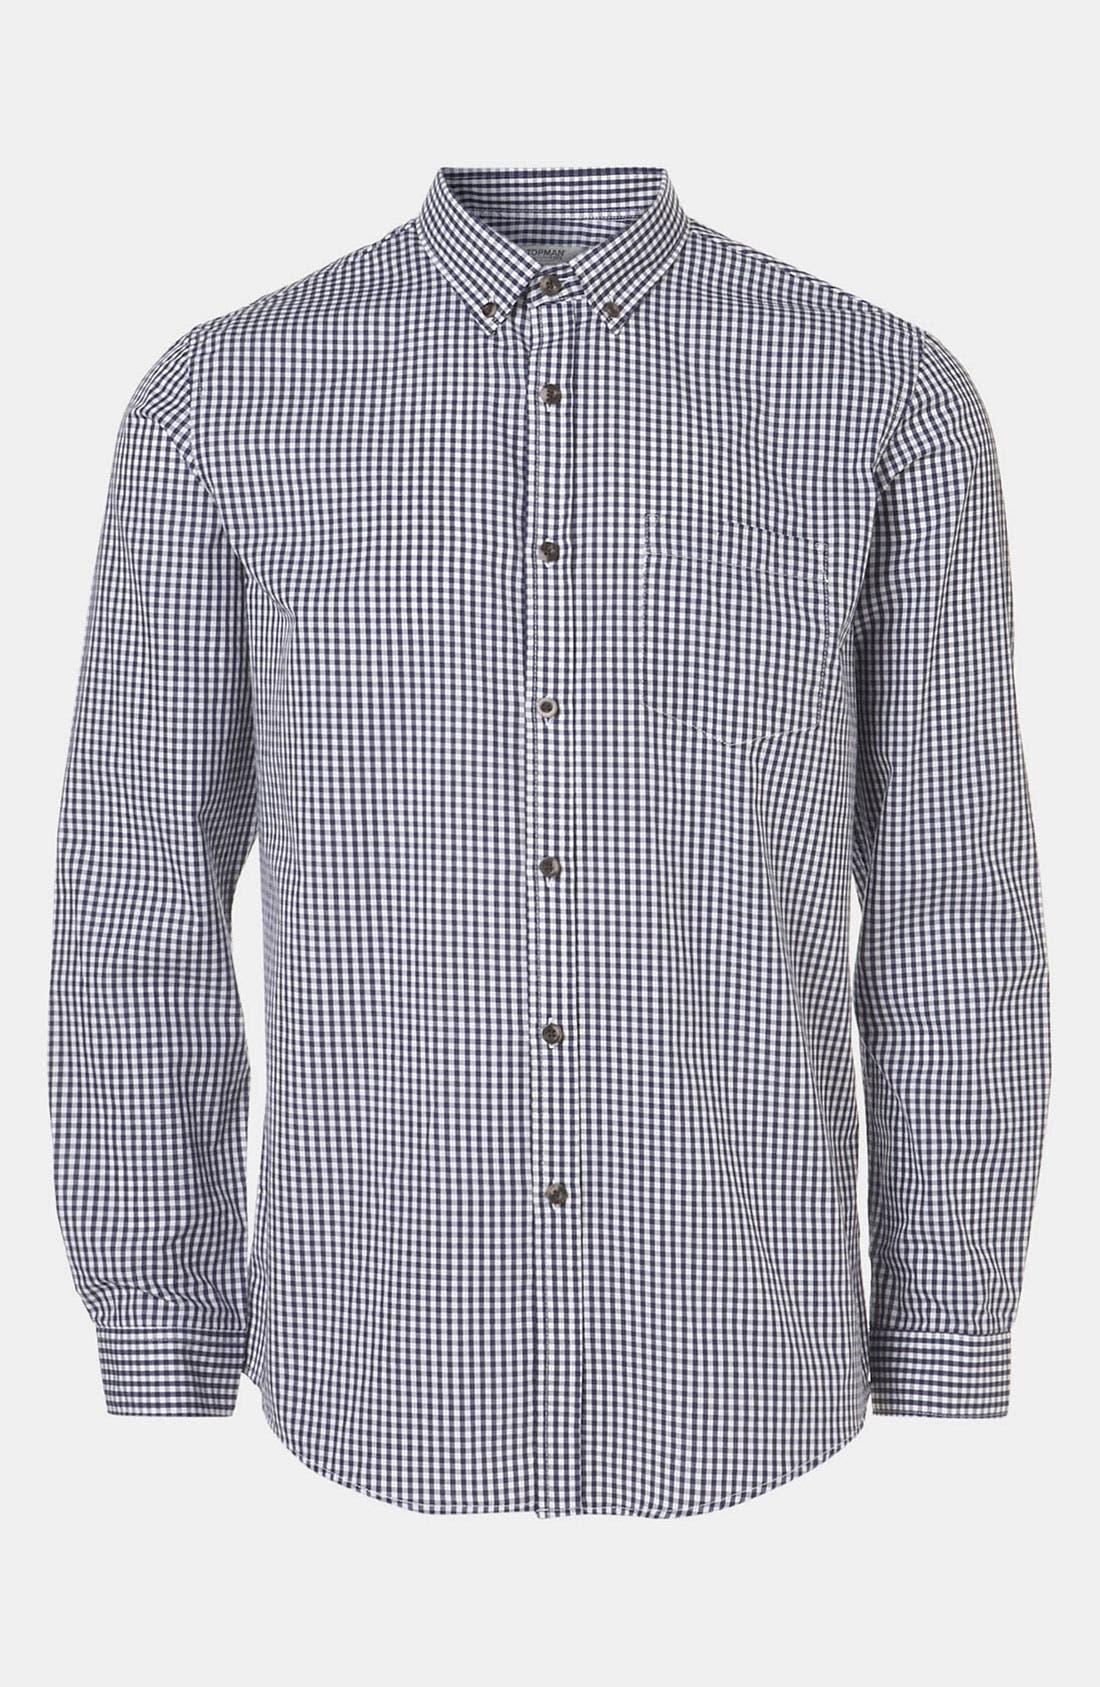 Alternate Image 1 Selected - Topman Extra Trim Gingham Check Shirt